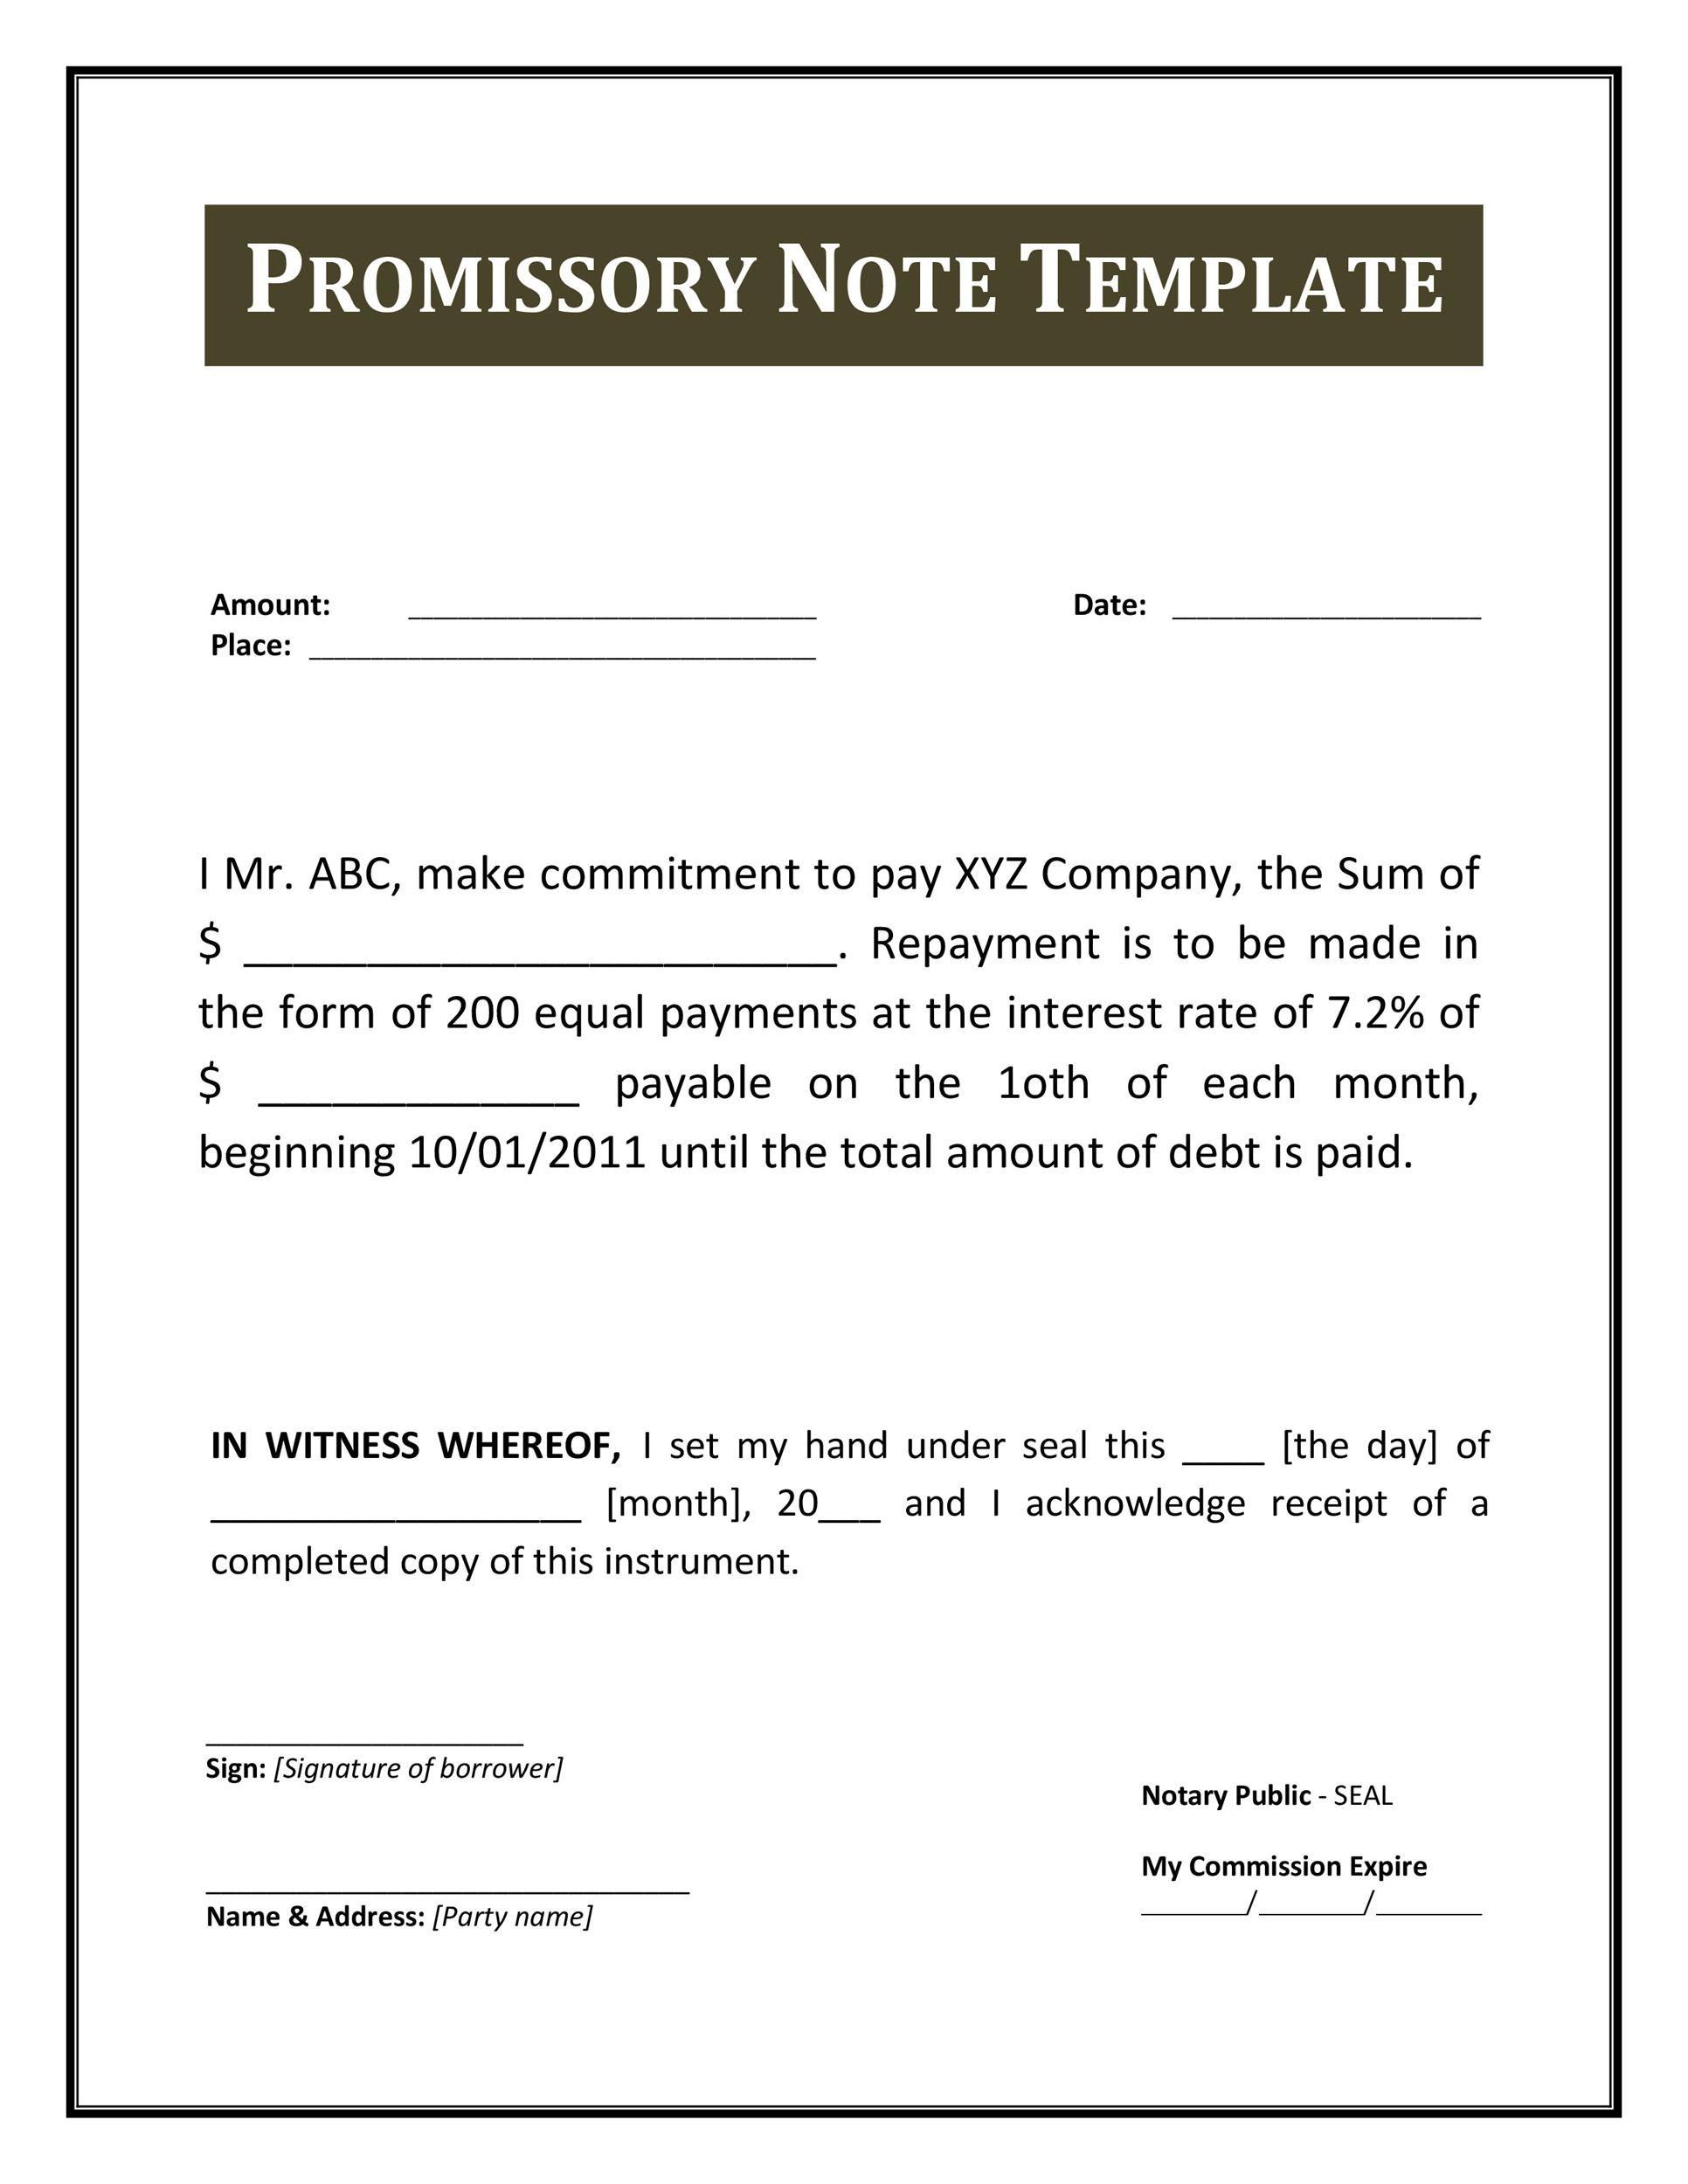 007 Dreaded Promissory Note Template Free High Resolution  Pdf Florida Blank FormFull